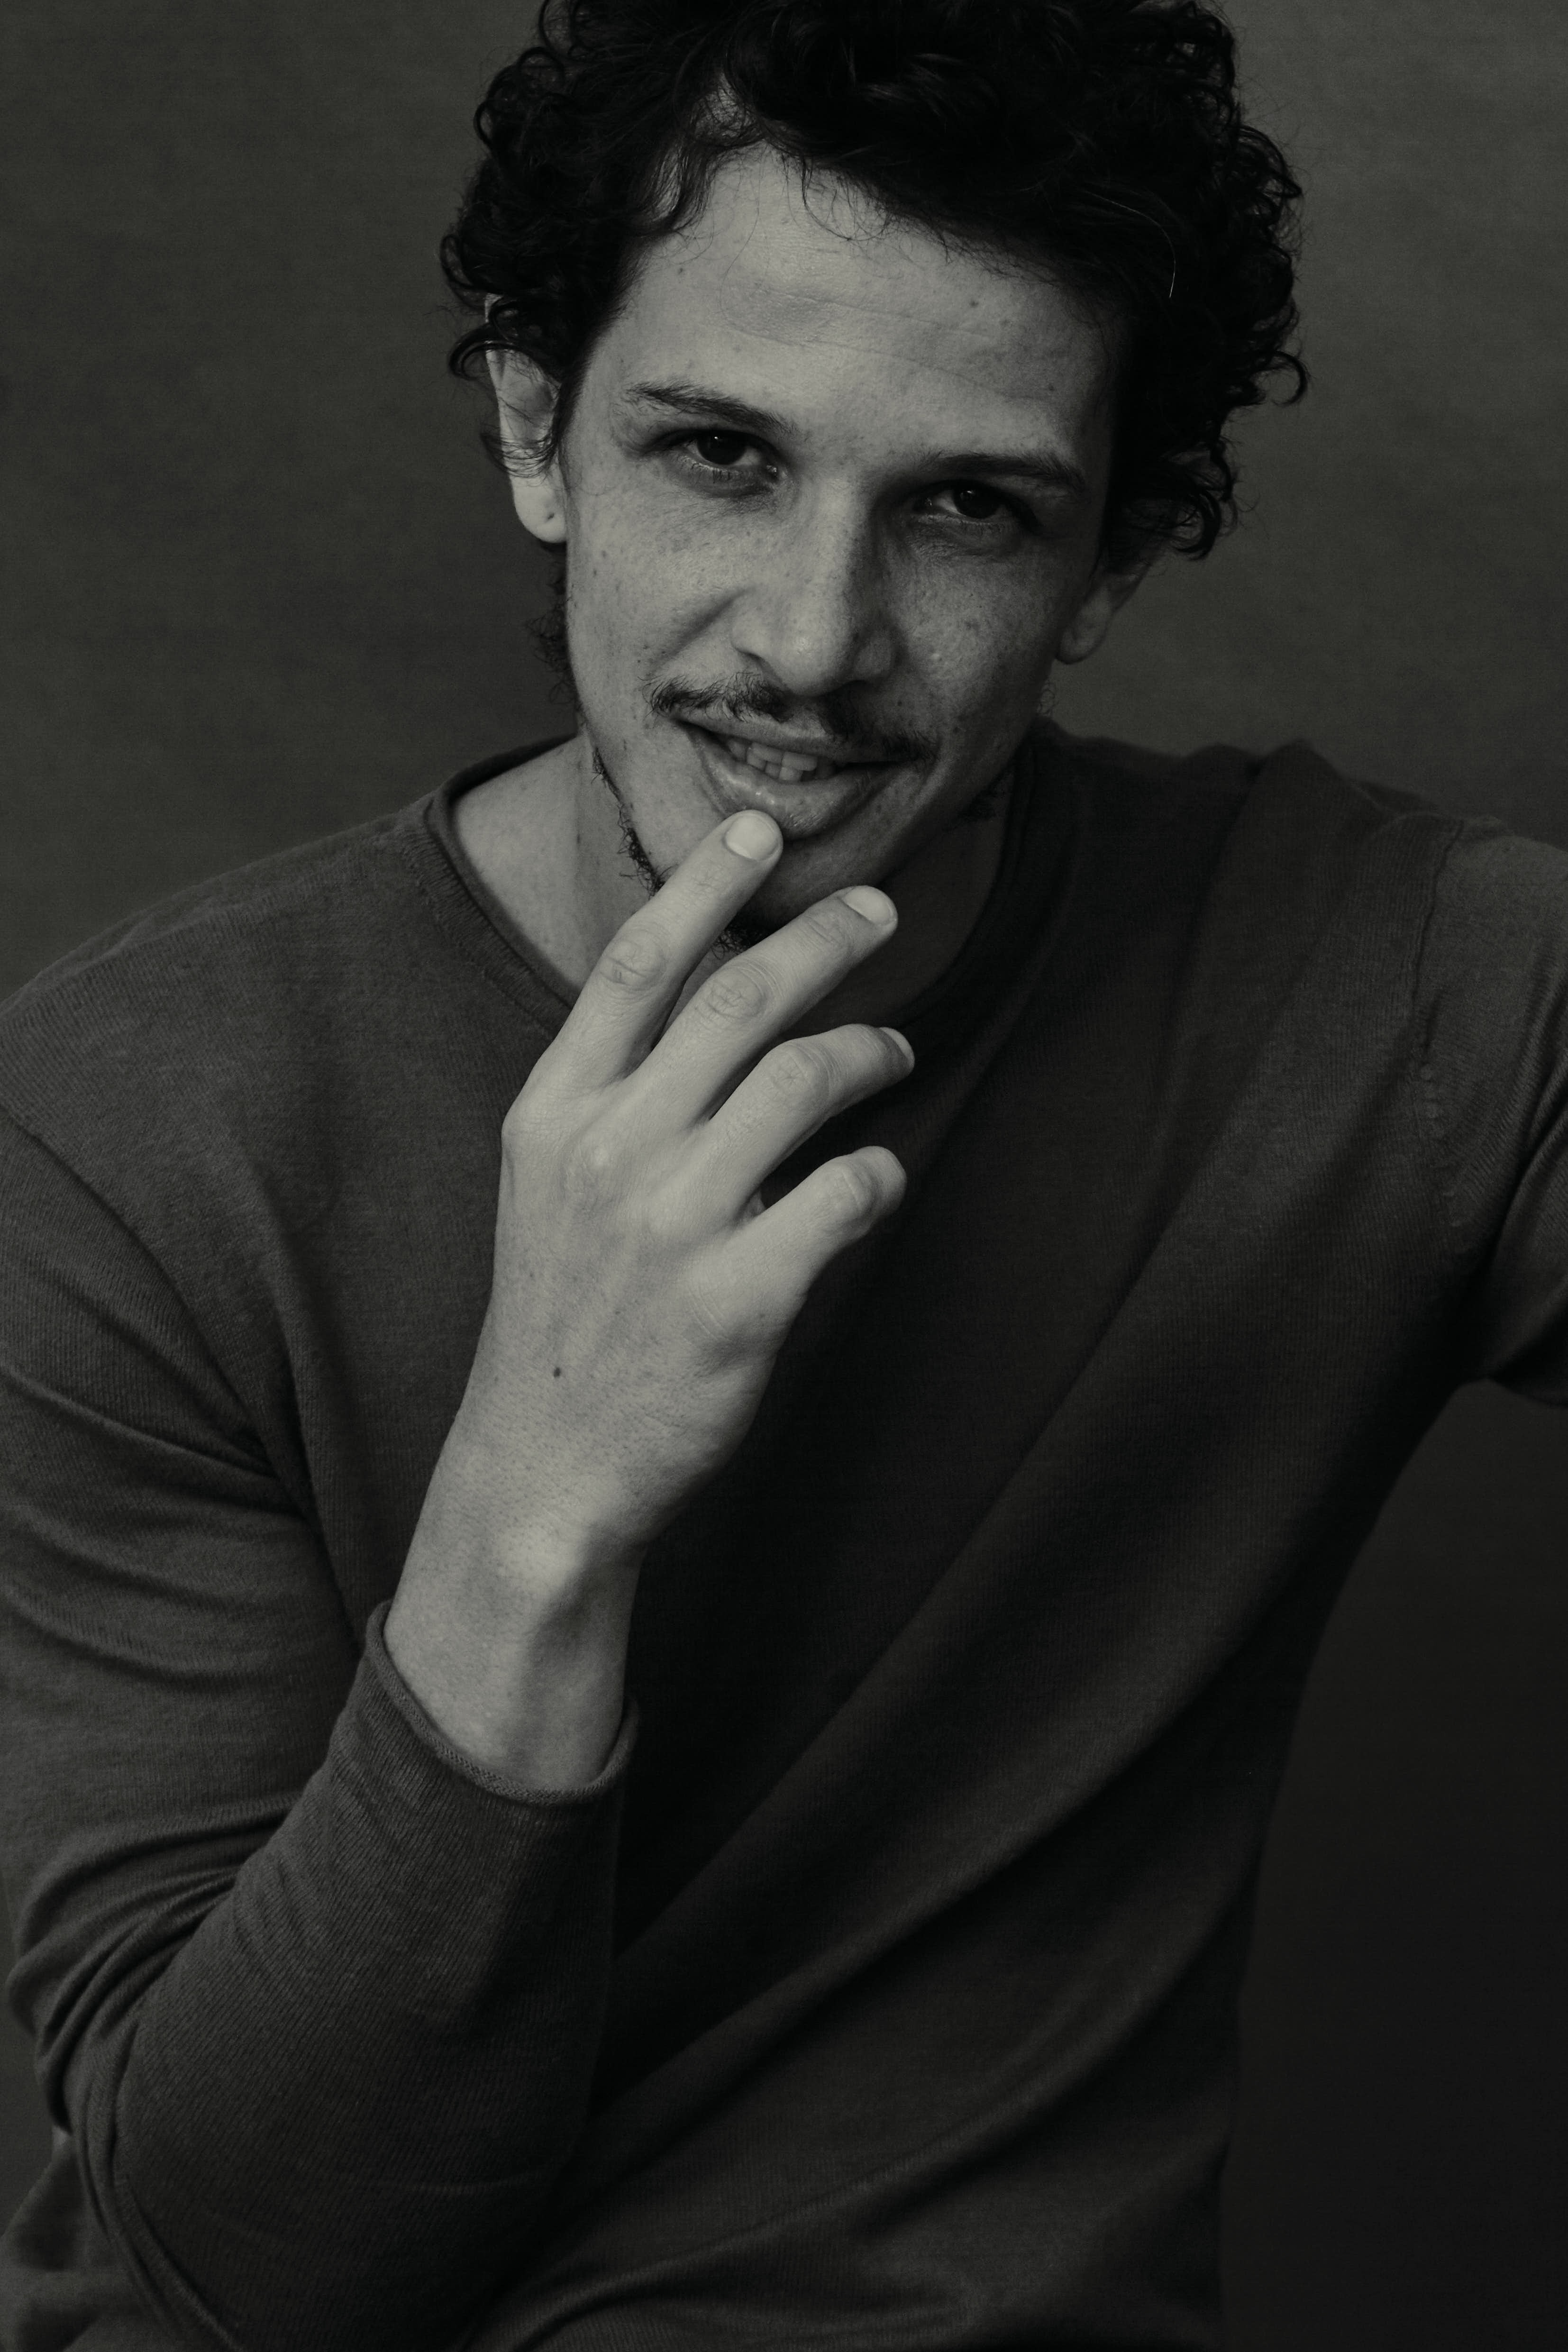 Rafael Losso (Foto: Foto: Leo Fagherazzi / Styling: Rafael Menezes / Beauty: Vanessa Sena)